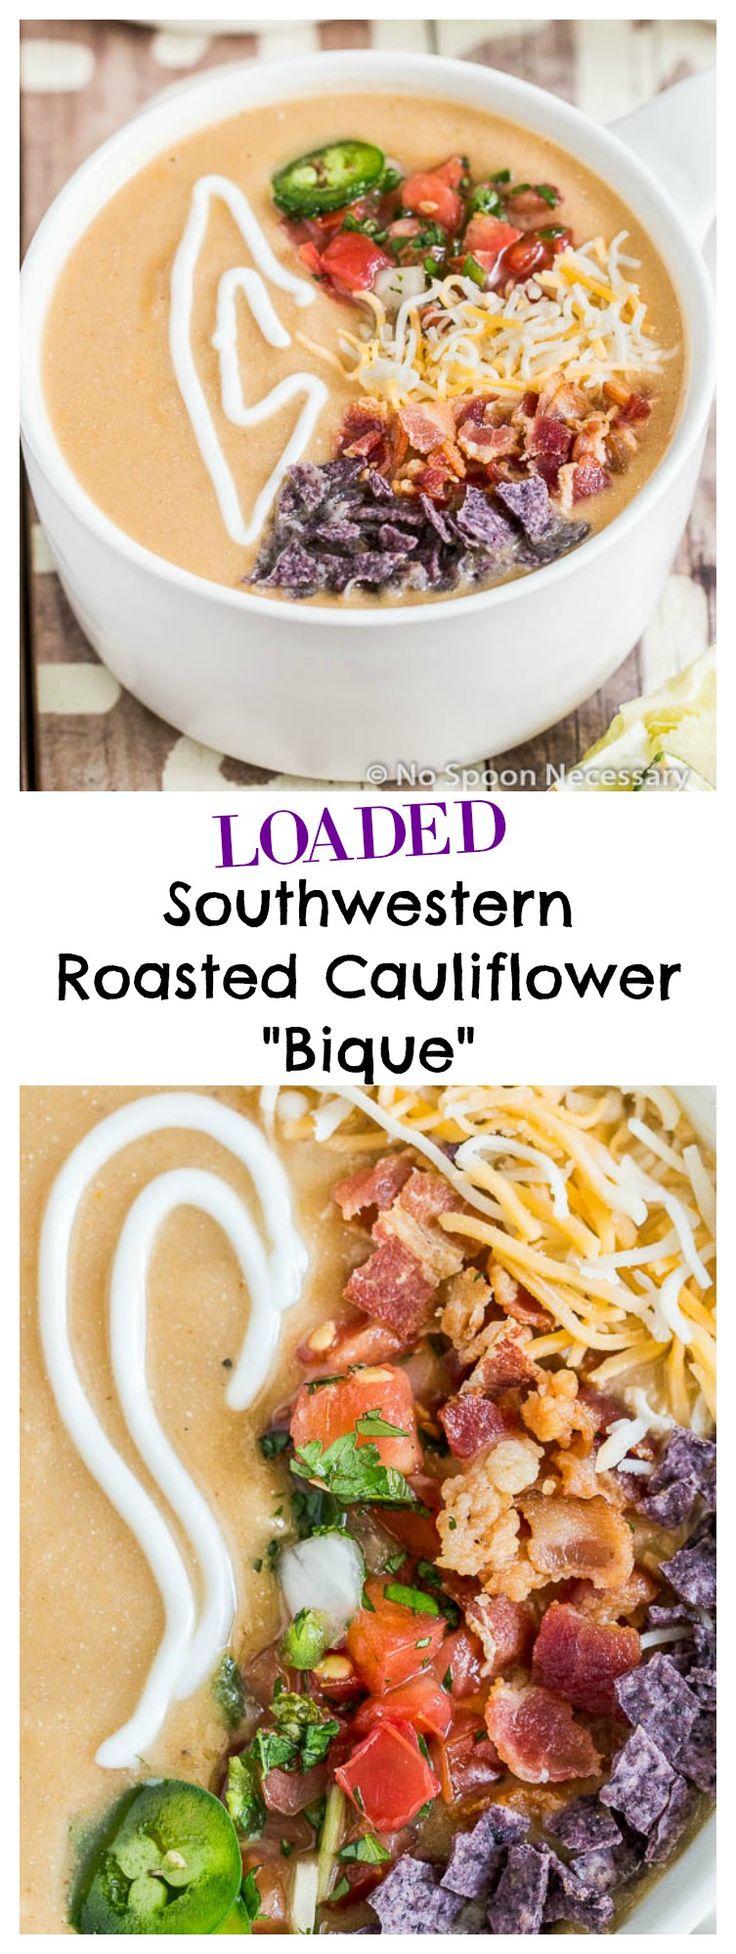 Loaded Southwestern Roasted Cauliflower Bisque